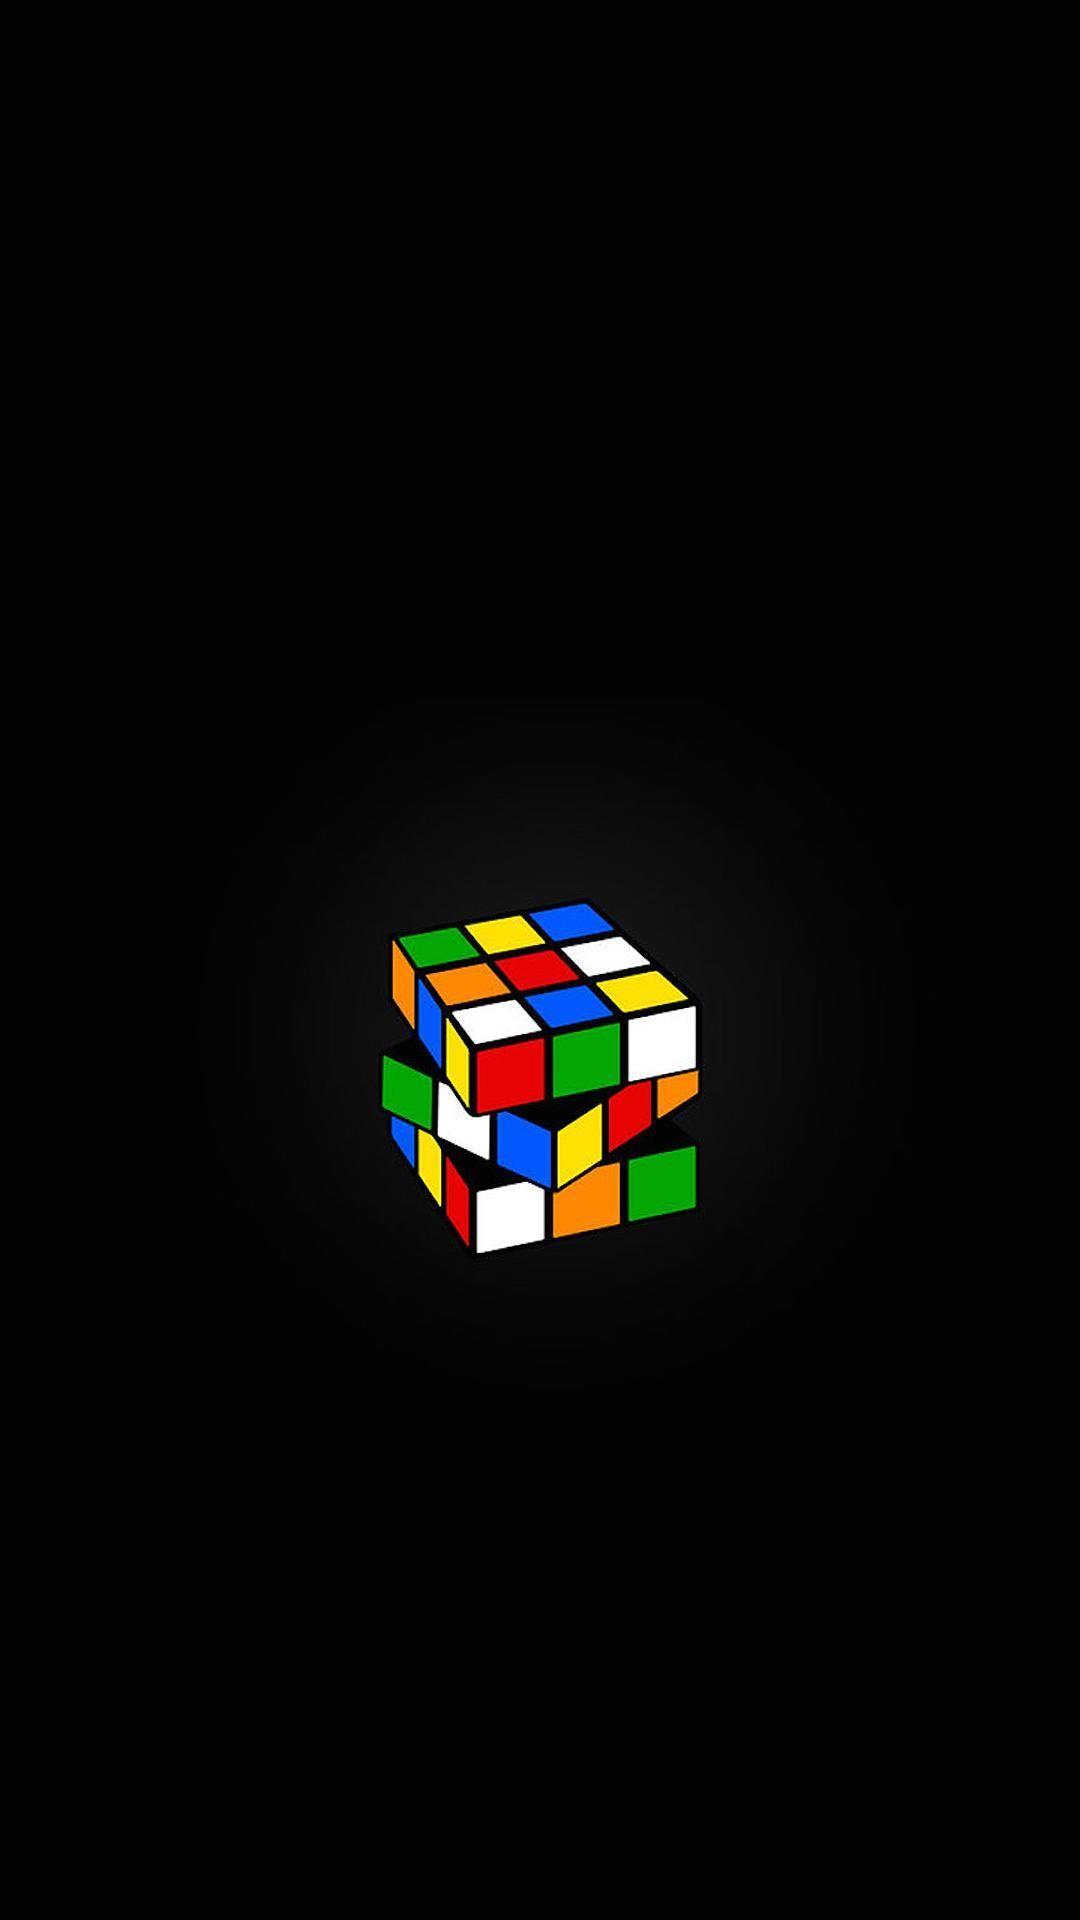 3d Cube Wallpaper Hd Rubiks Cube Wallpaper 76 Images